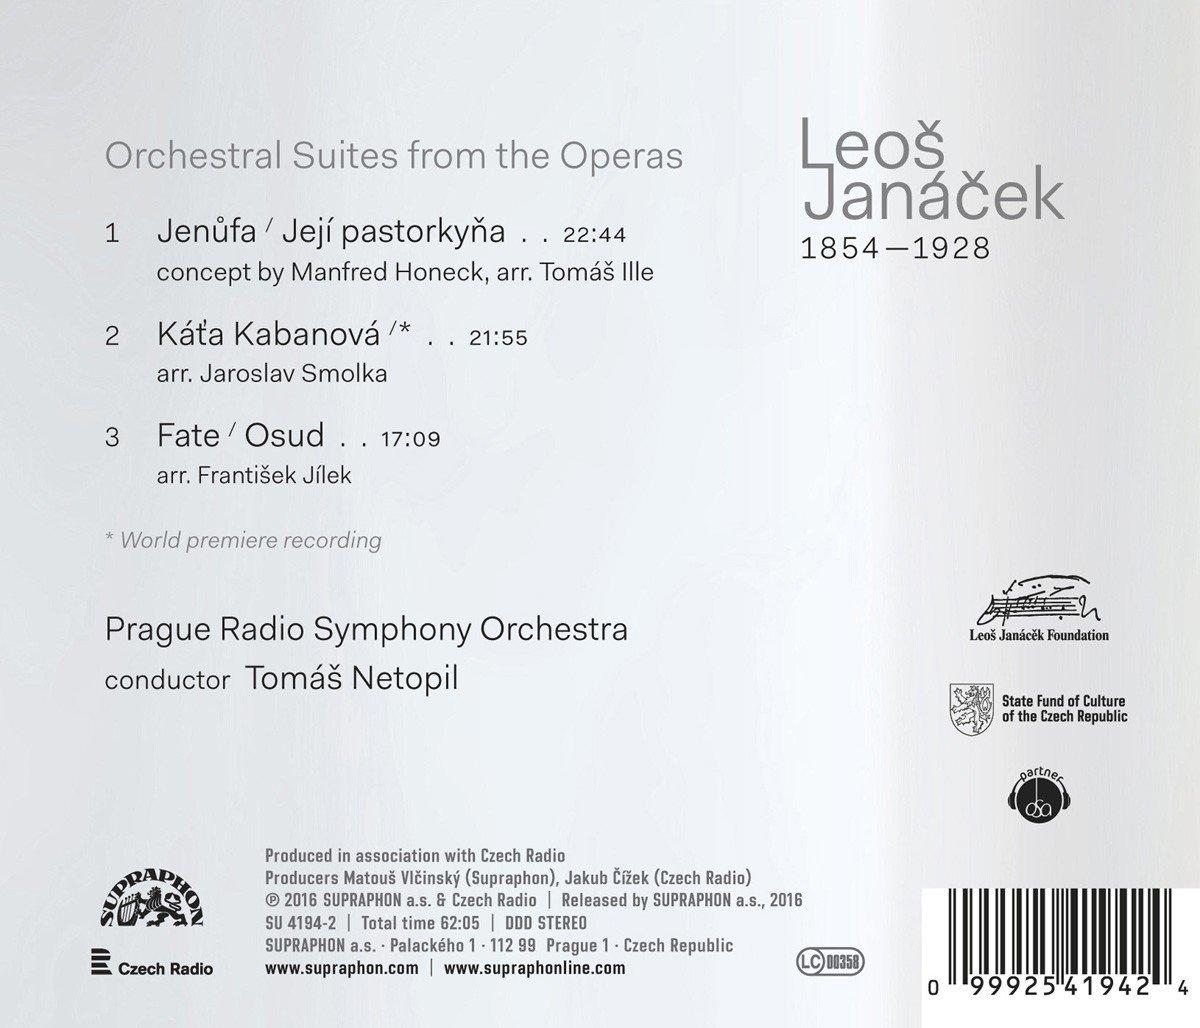 Leo Janácek: Orchestral Suites by Naxos of America, Inc.